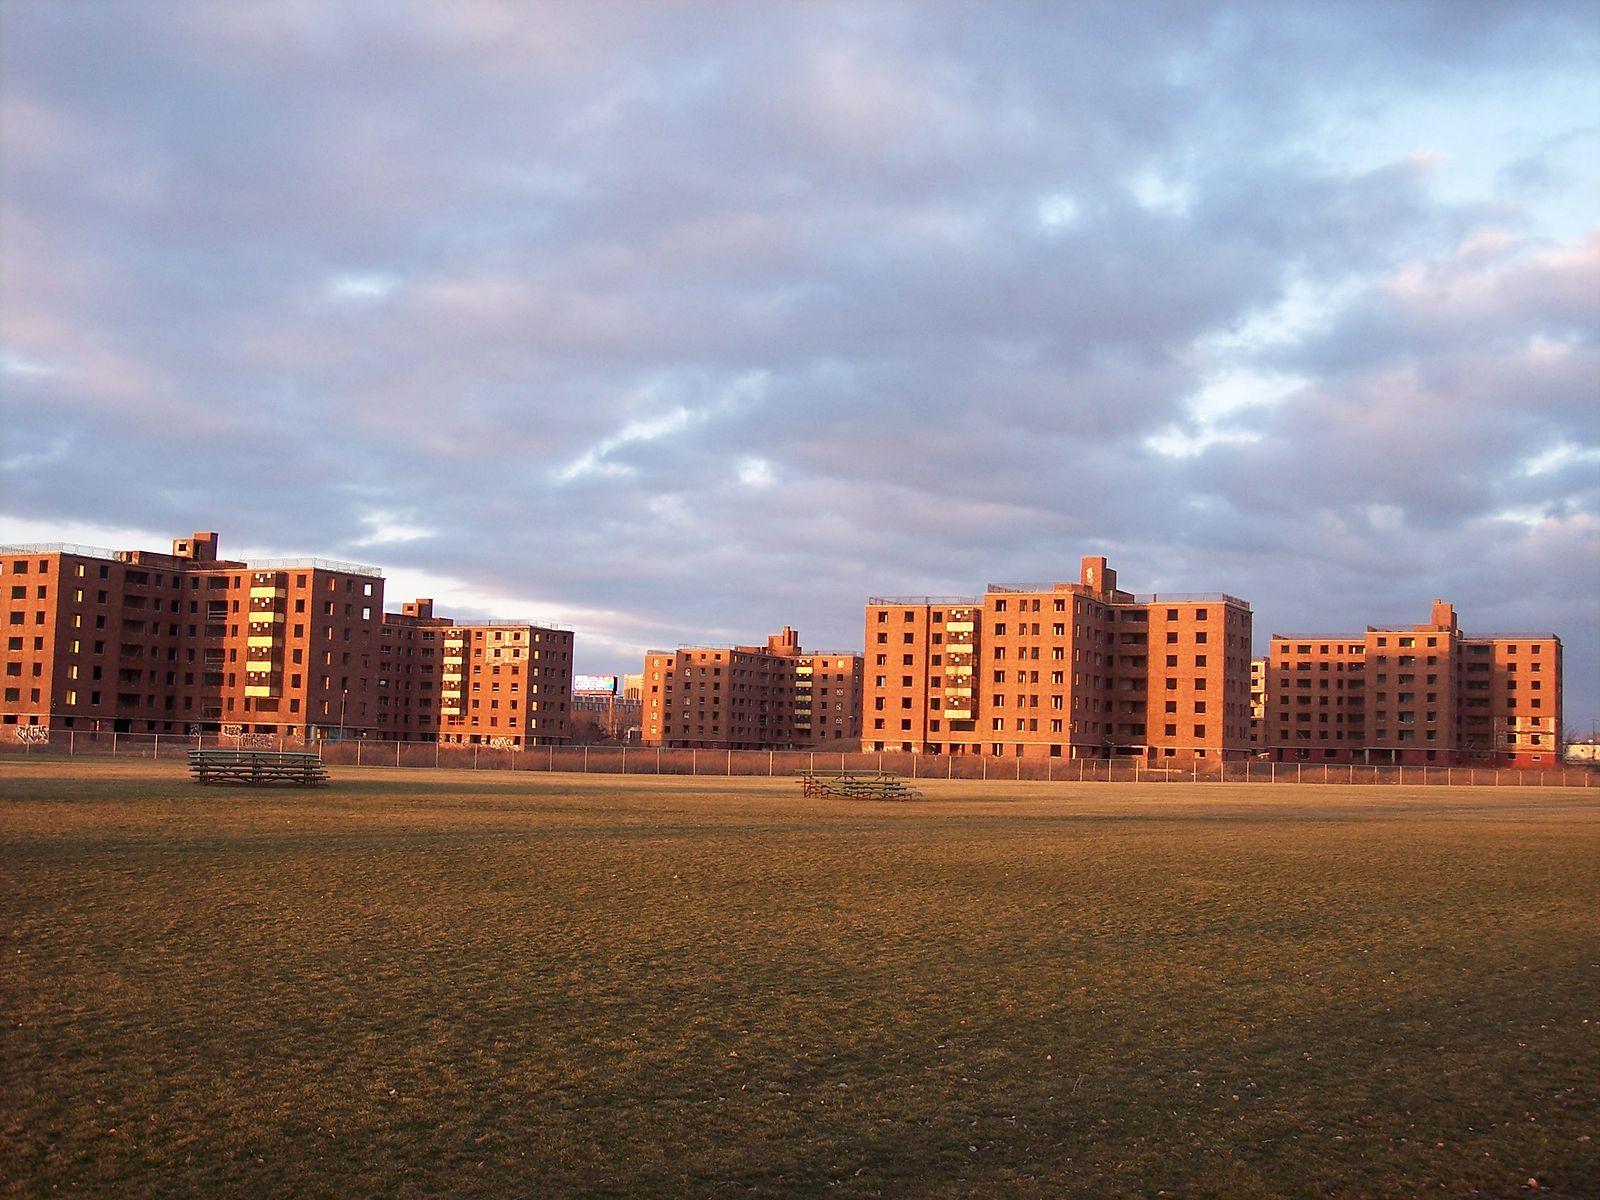 Public Housing of the Past